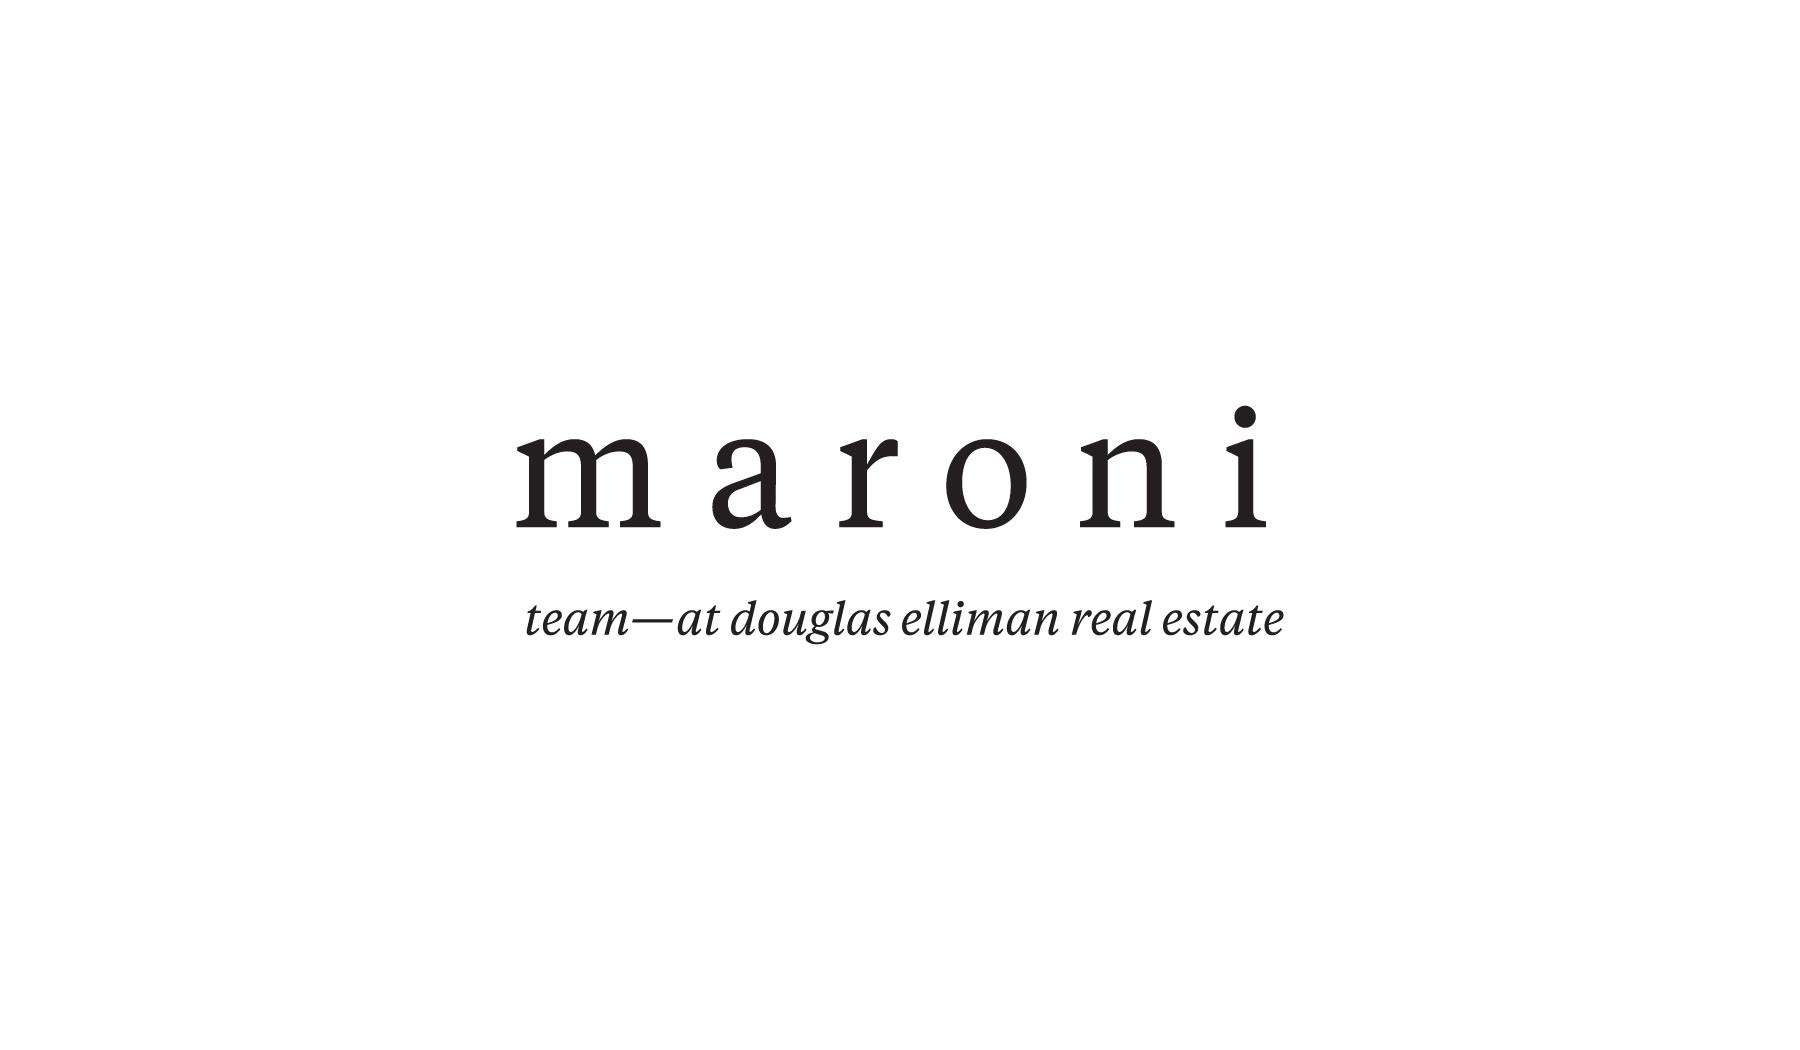 logo compilation_maroni-44.jpg